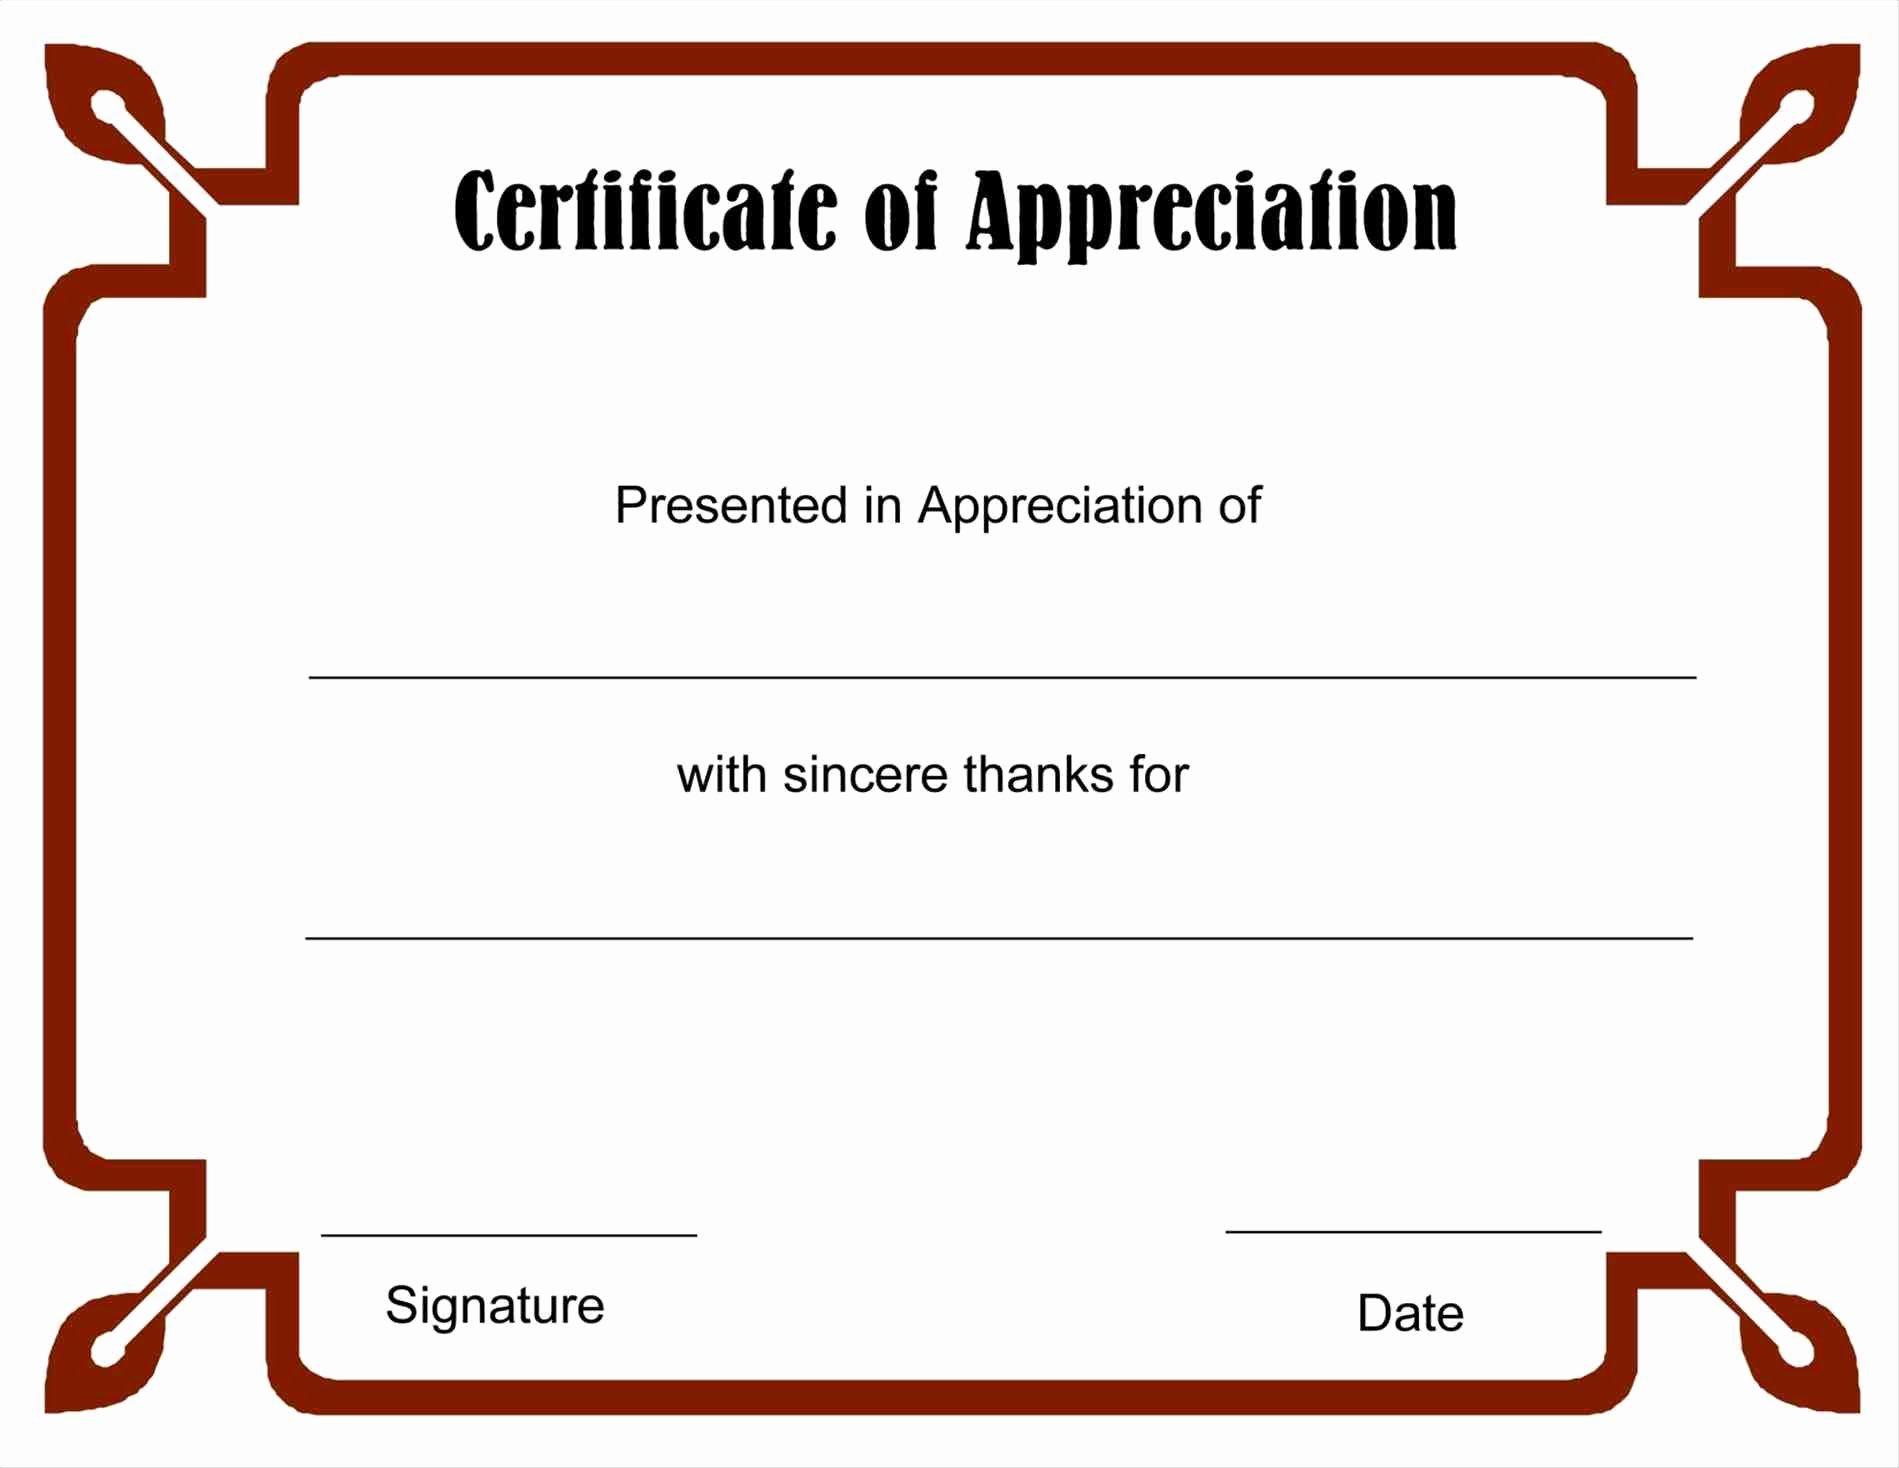 Volunteer Appreciation Certificate Template Best Of Download Free Certificate Appreciation Template